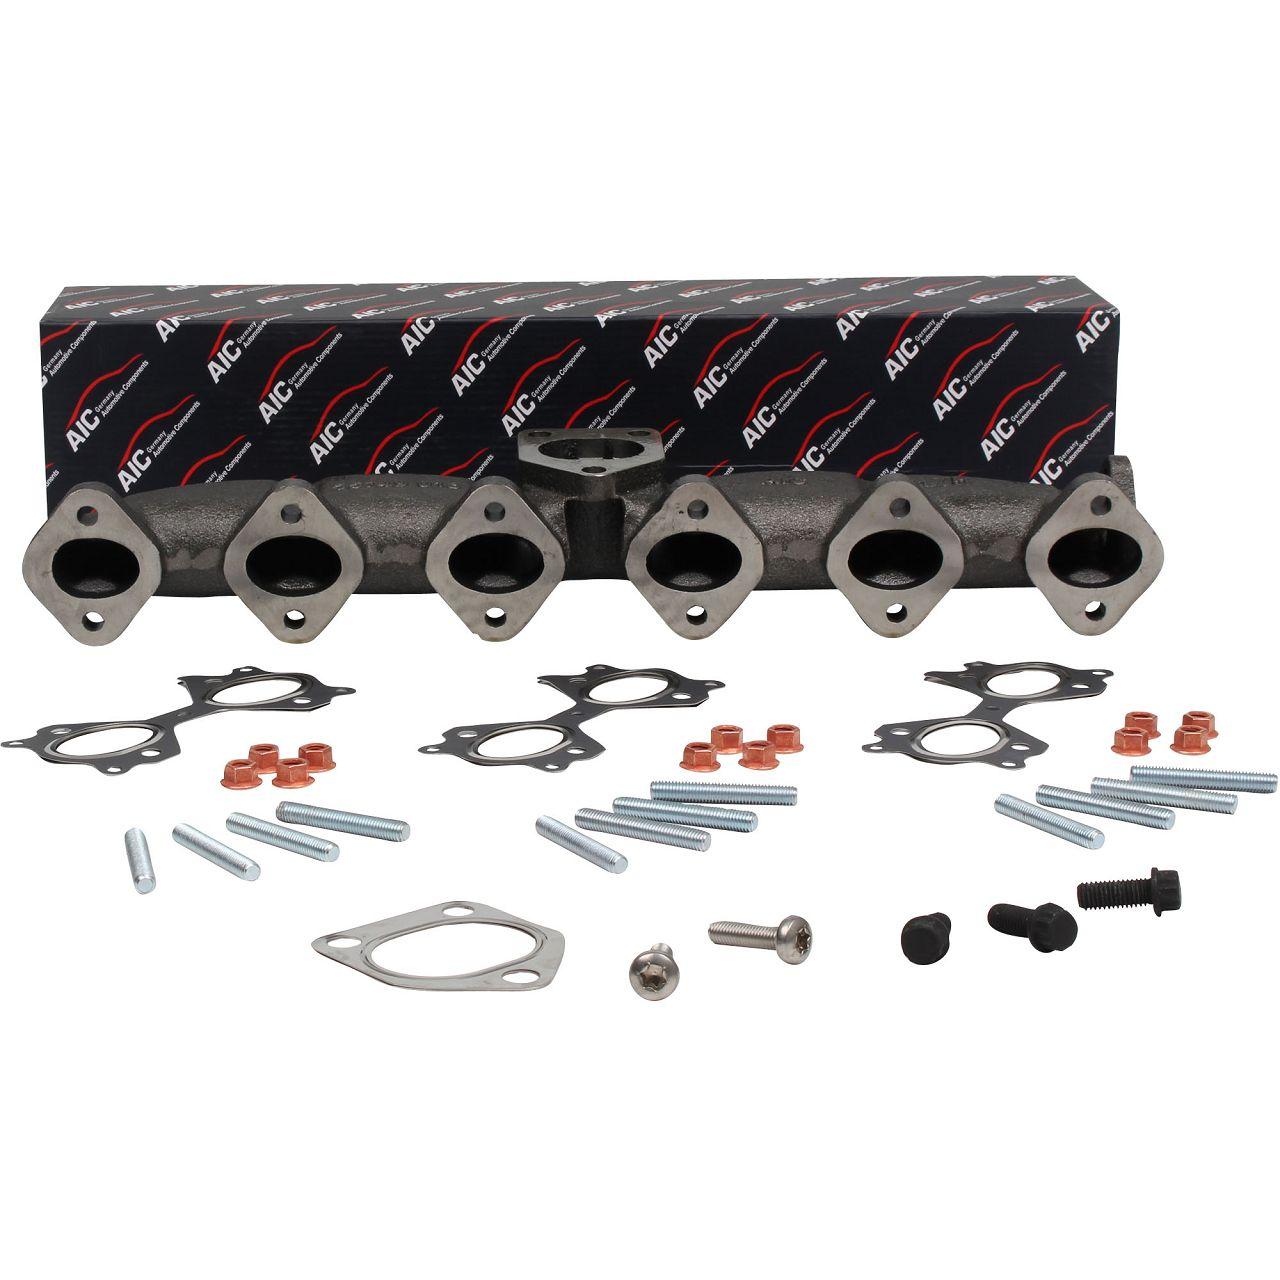 AIC 55749SET Auspuffkrümmer Abgaskrümmer für BMW E46 E60-61 E65-67 E83 E53 M57